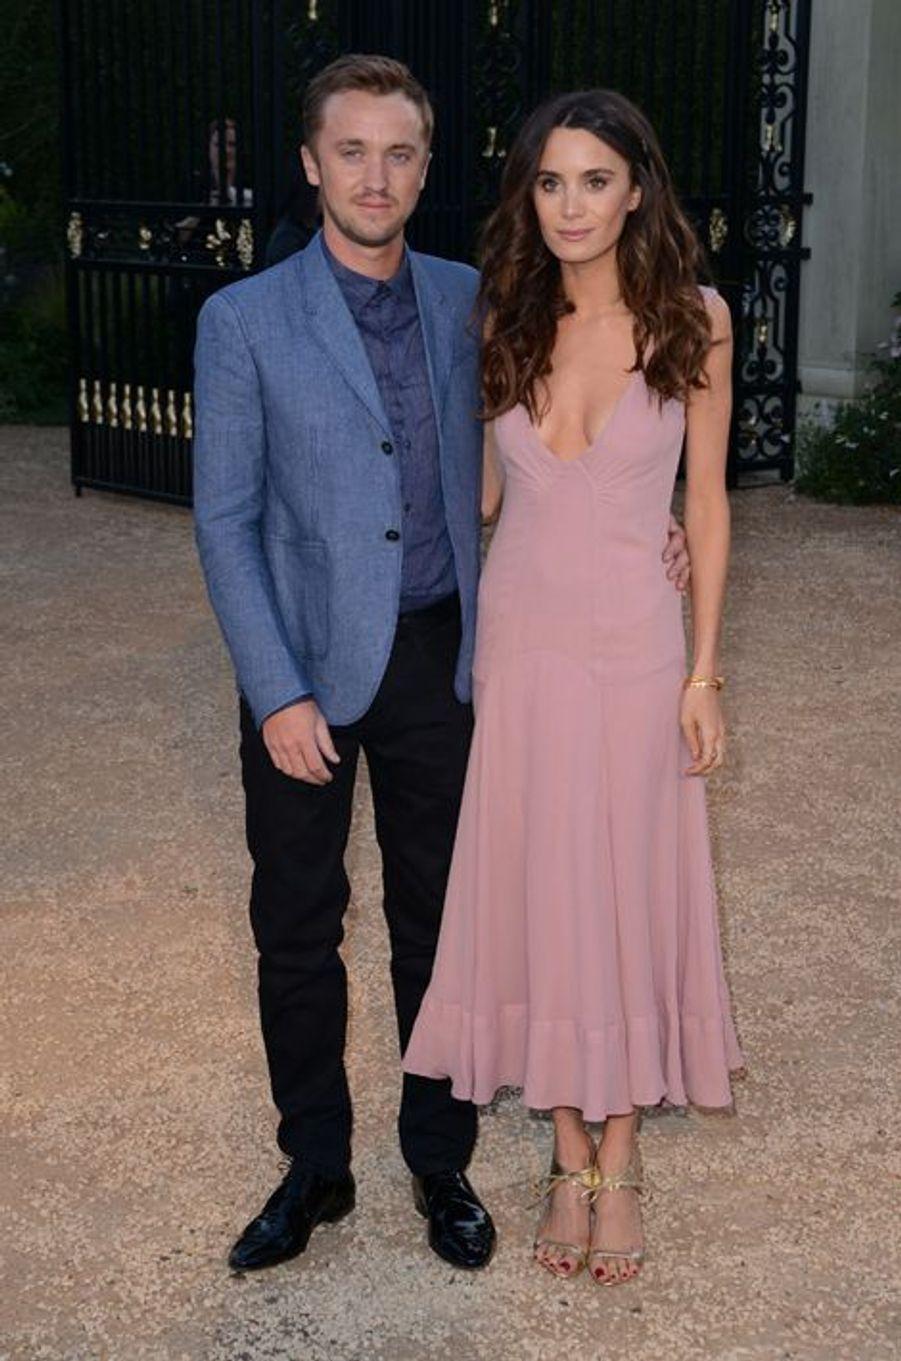 Tom Felton et sa petite amie Jade Olivia à Los Angeles le 16 avril 2015